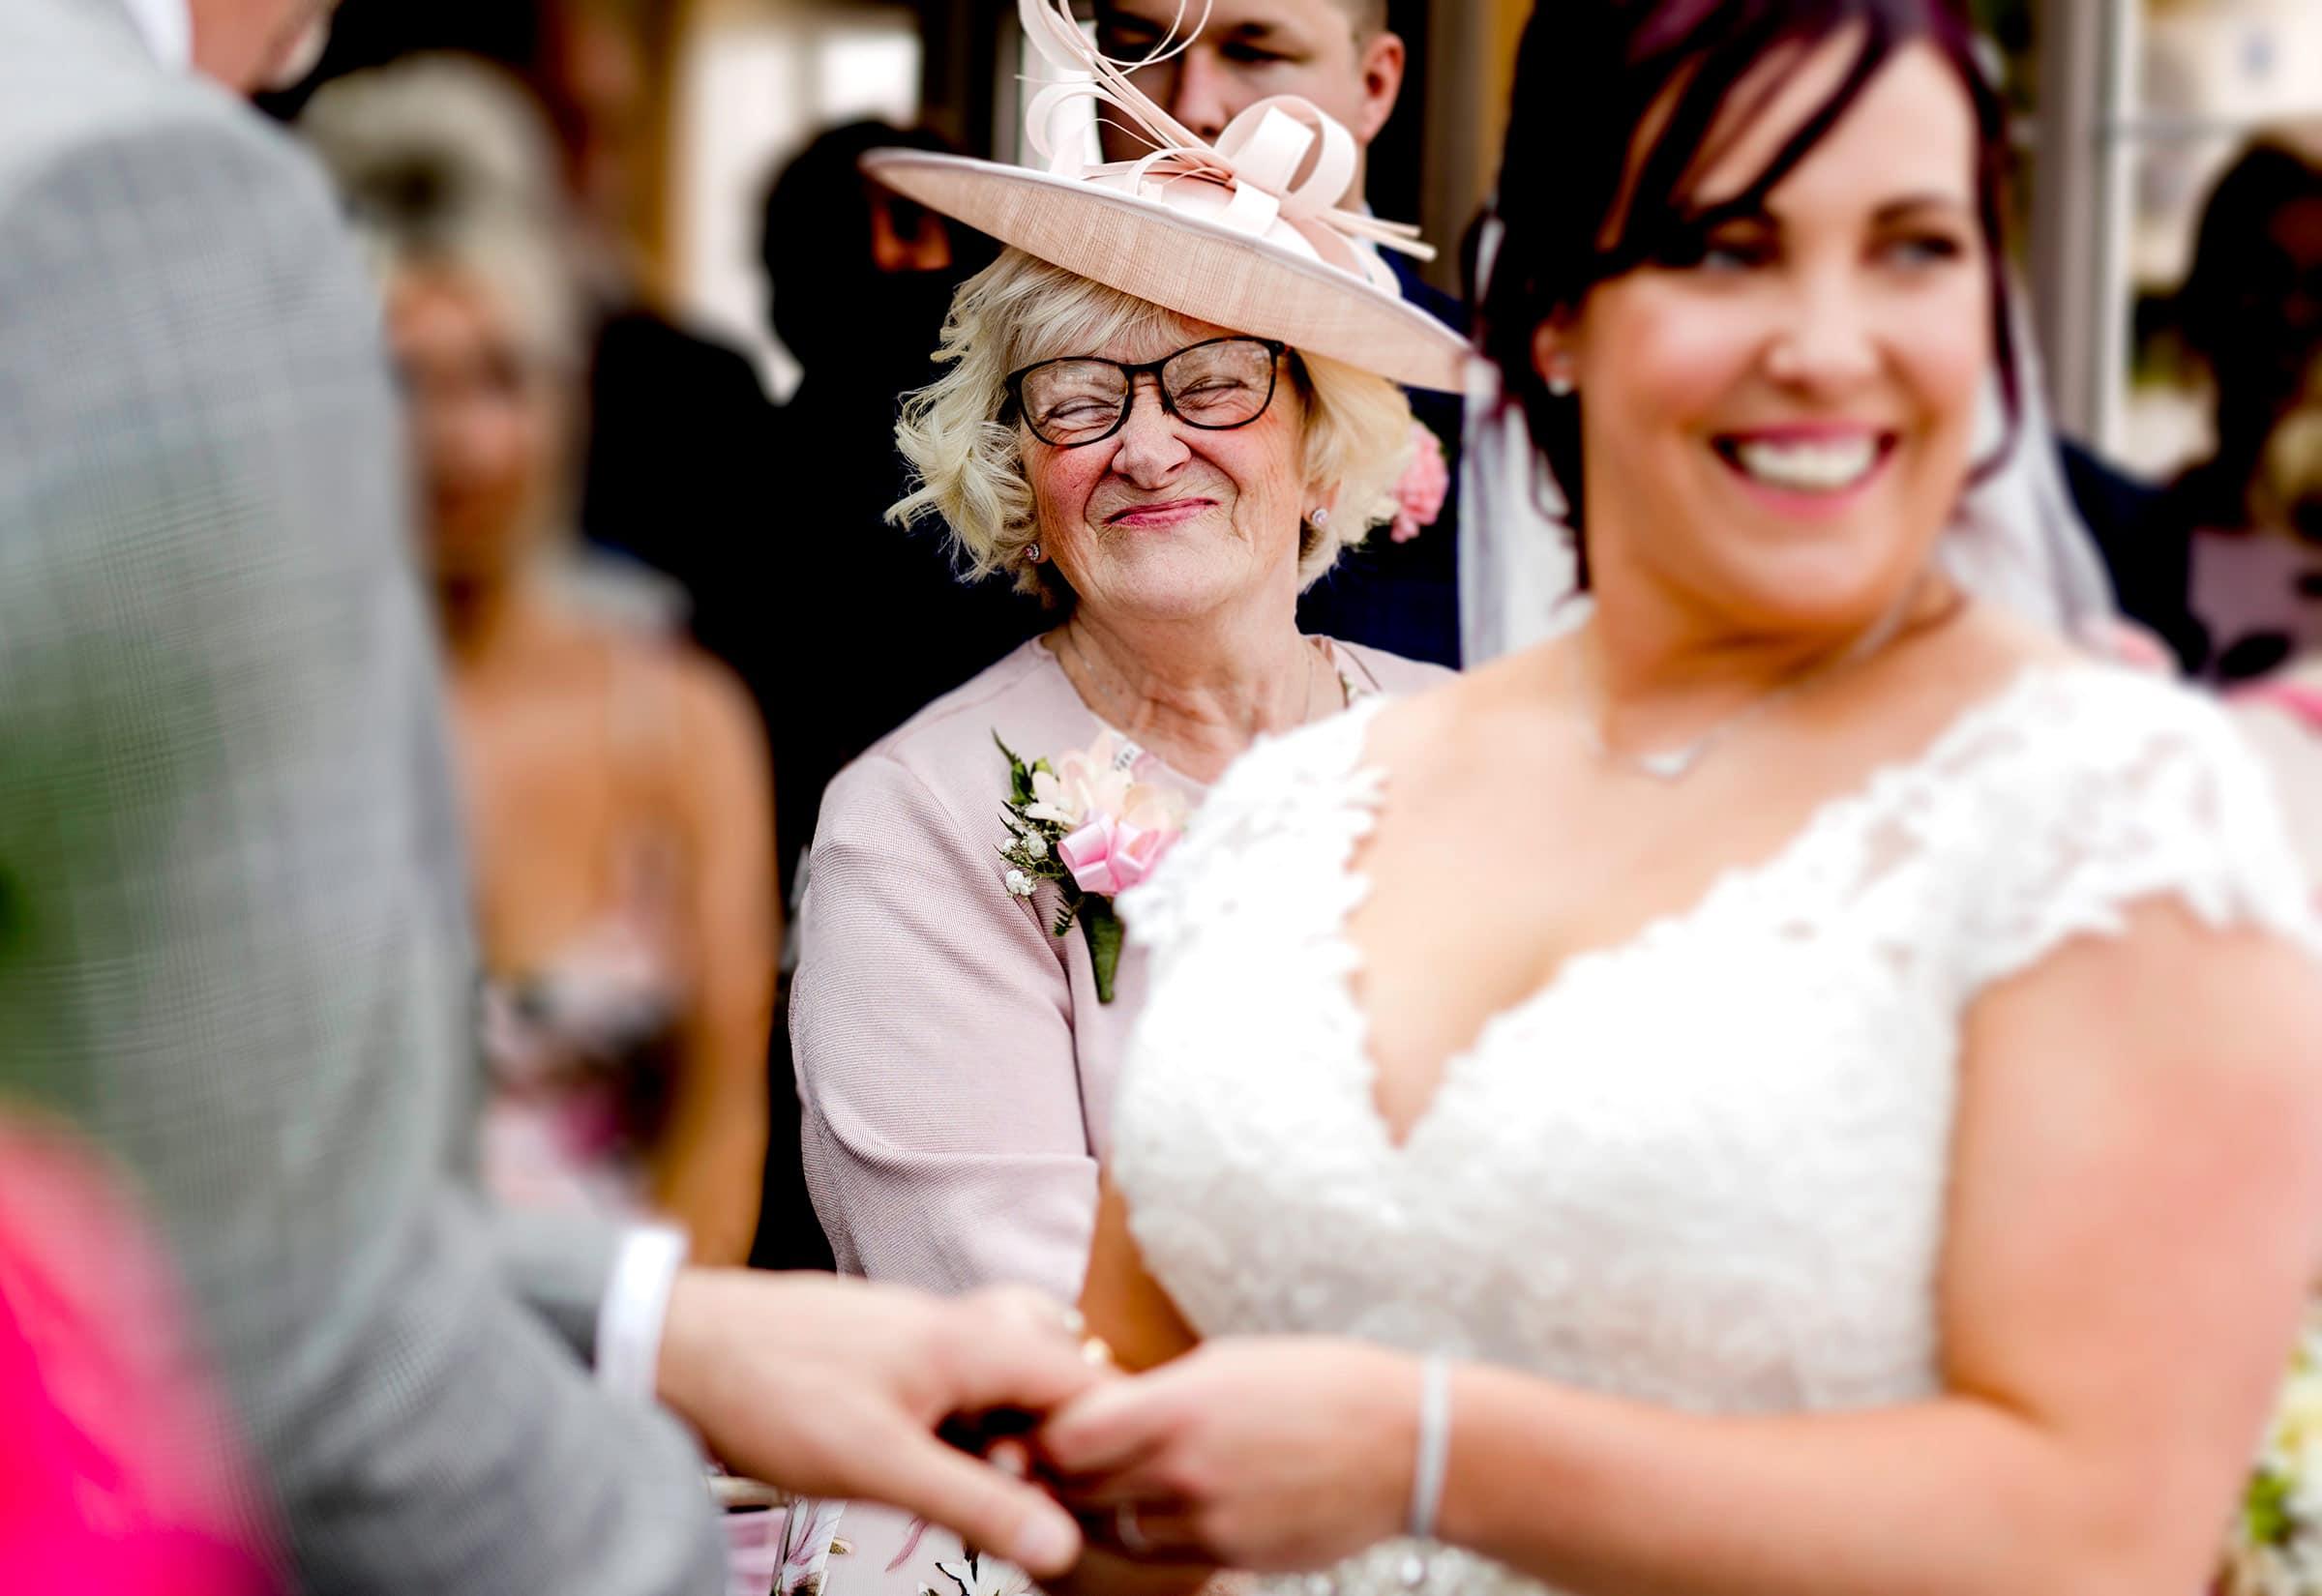 reportage wedding photography wales